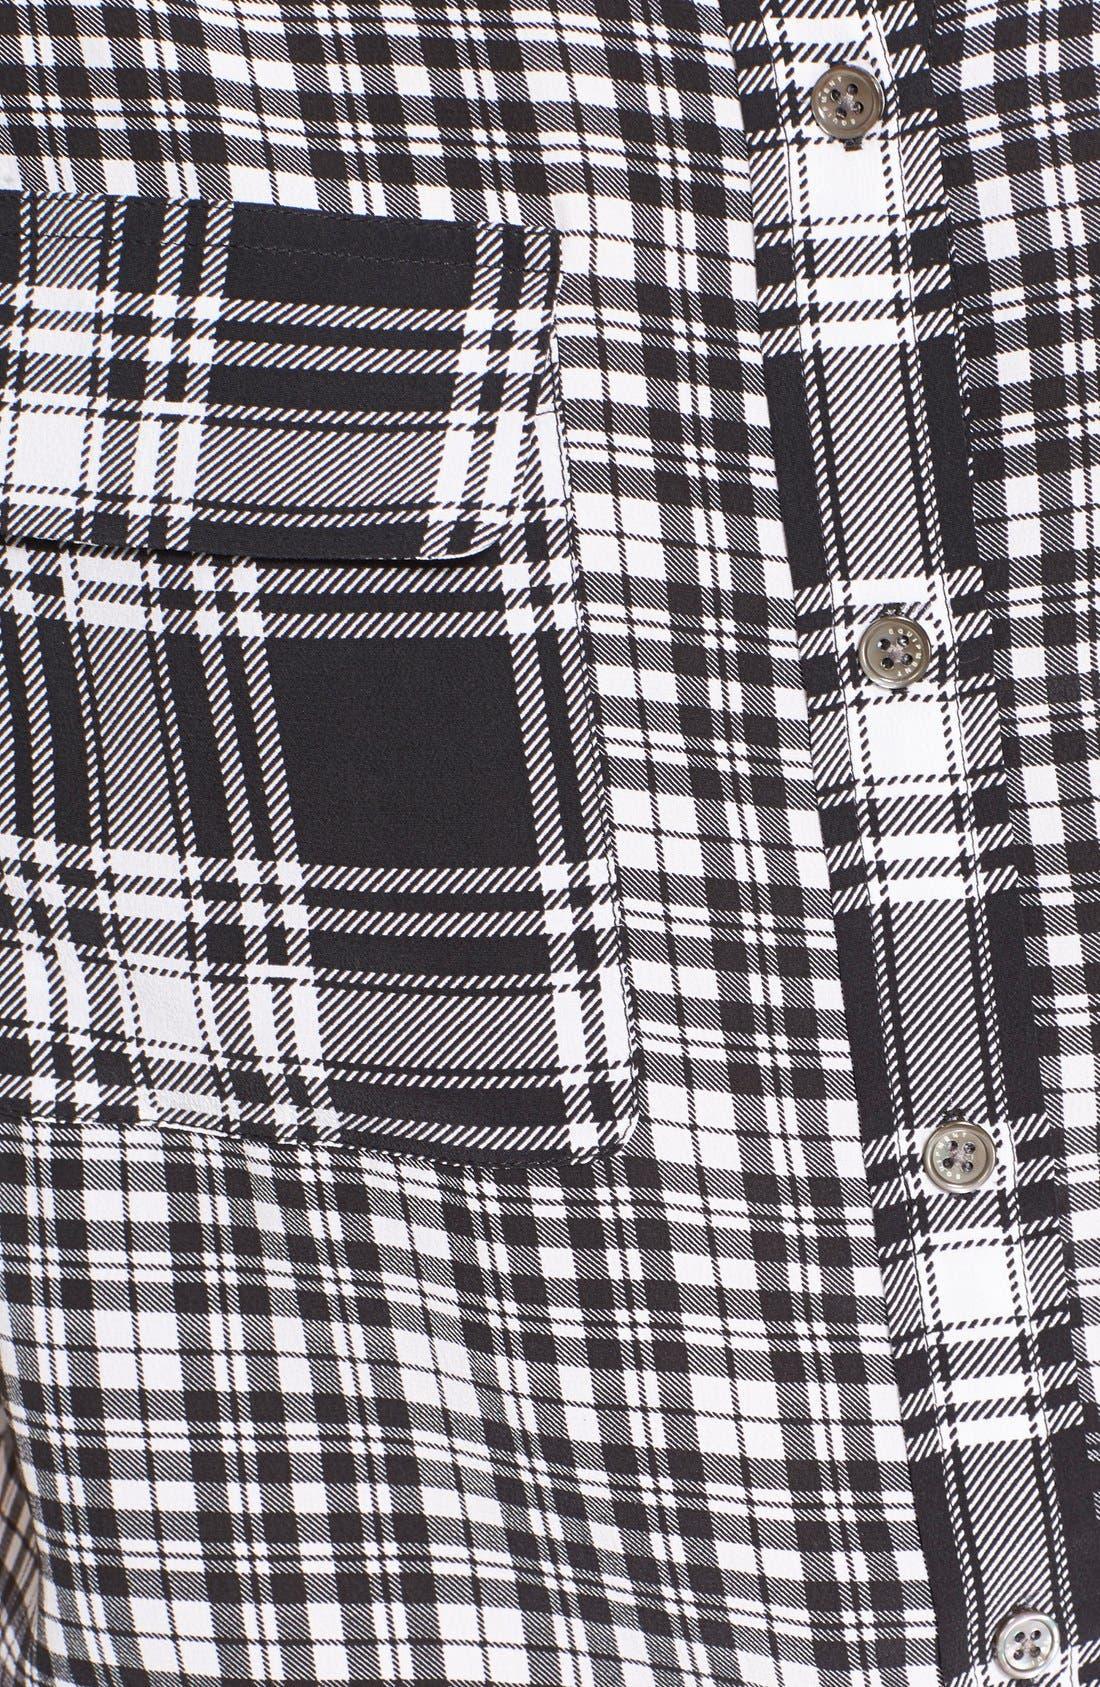 Alternate Image 3  - Equipment 'Signature' Plaid Print Silk Shirt